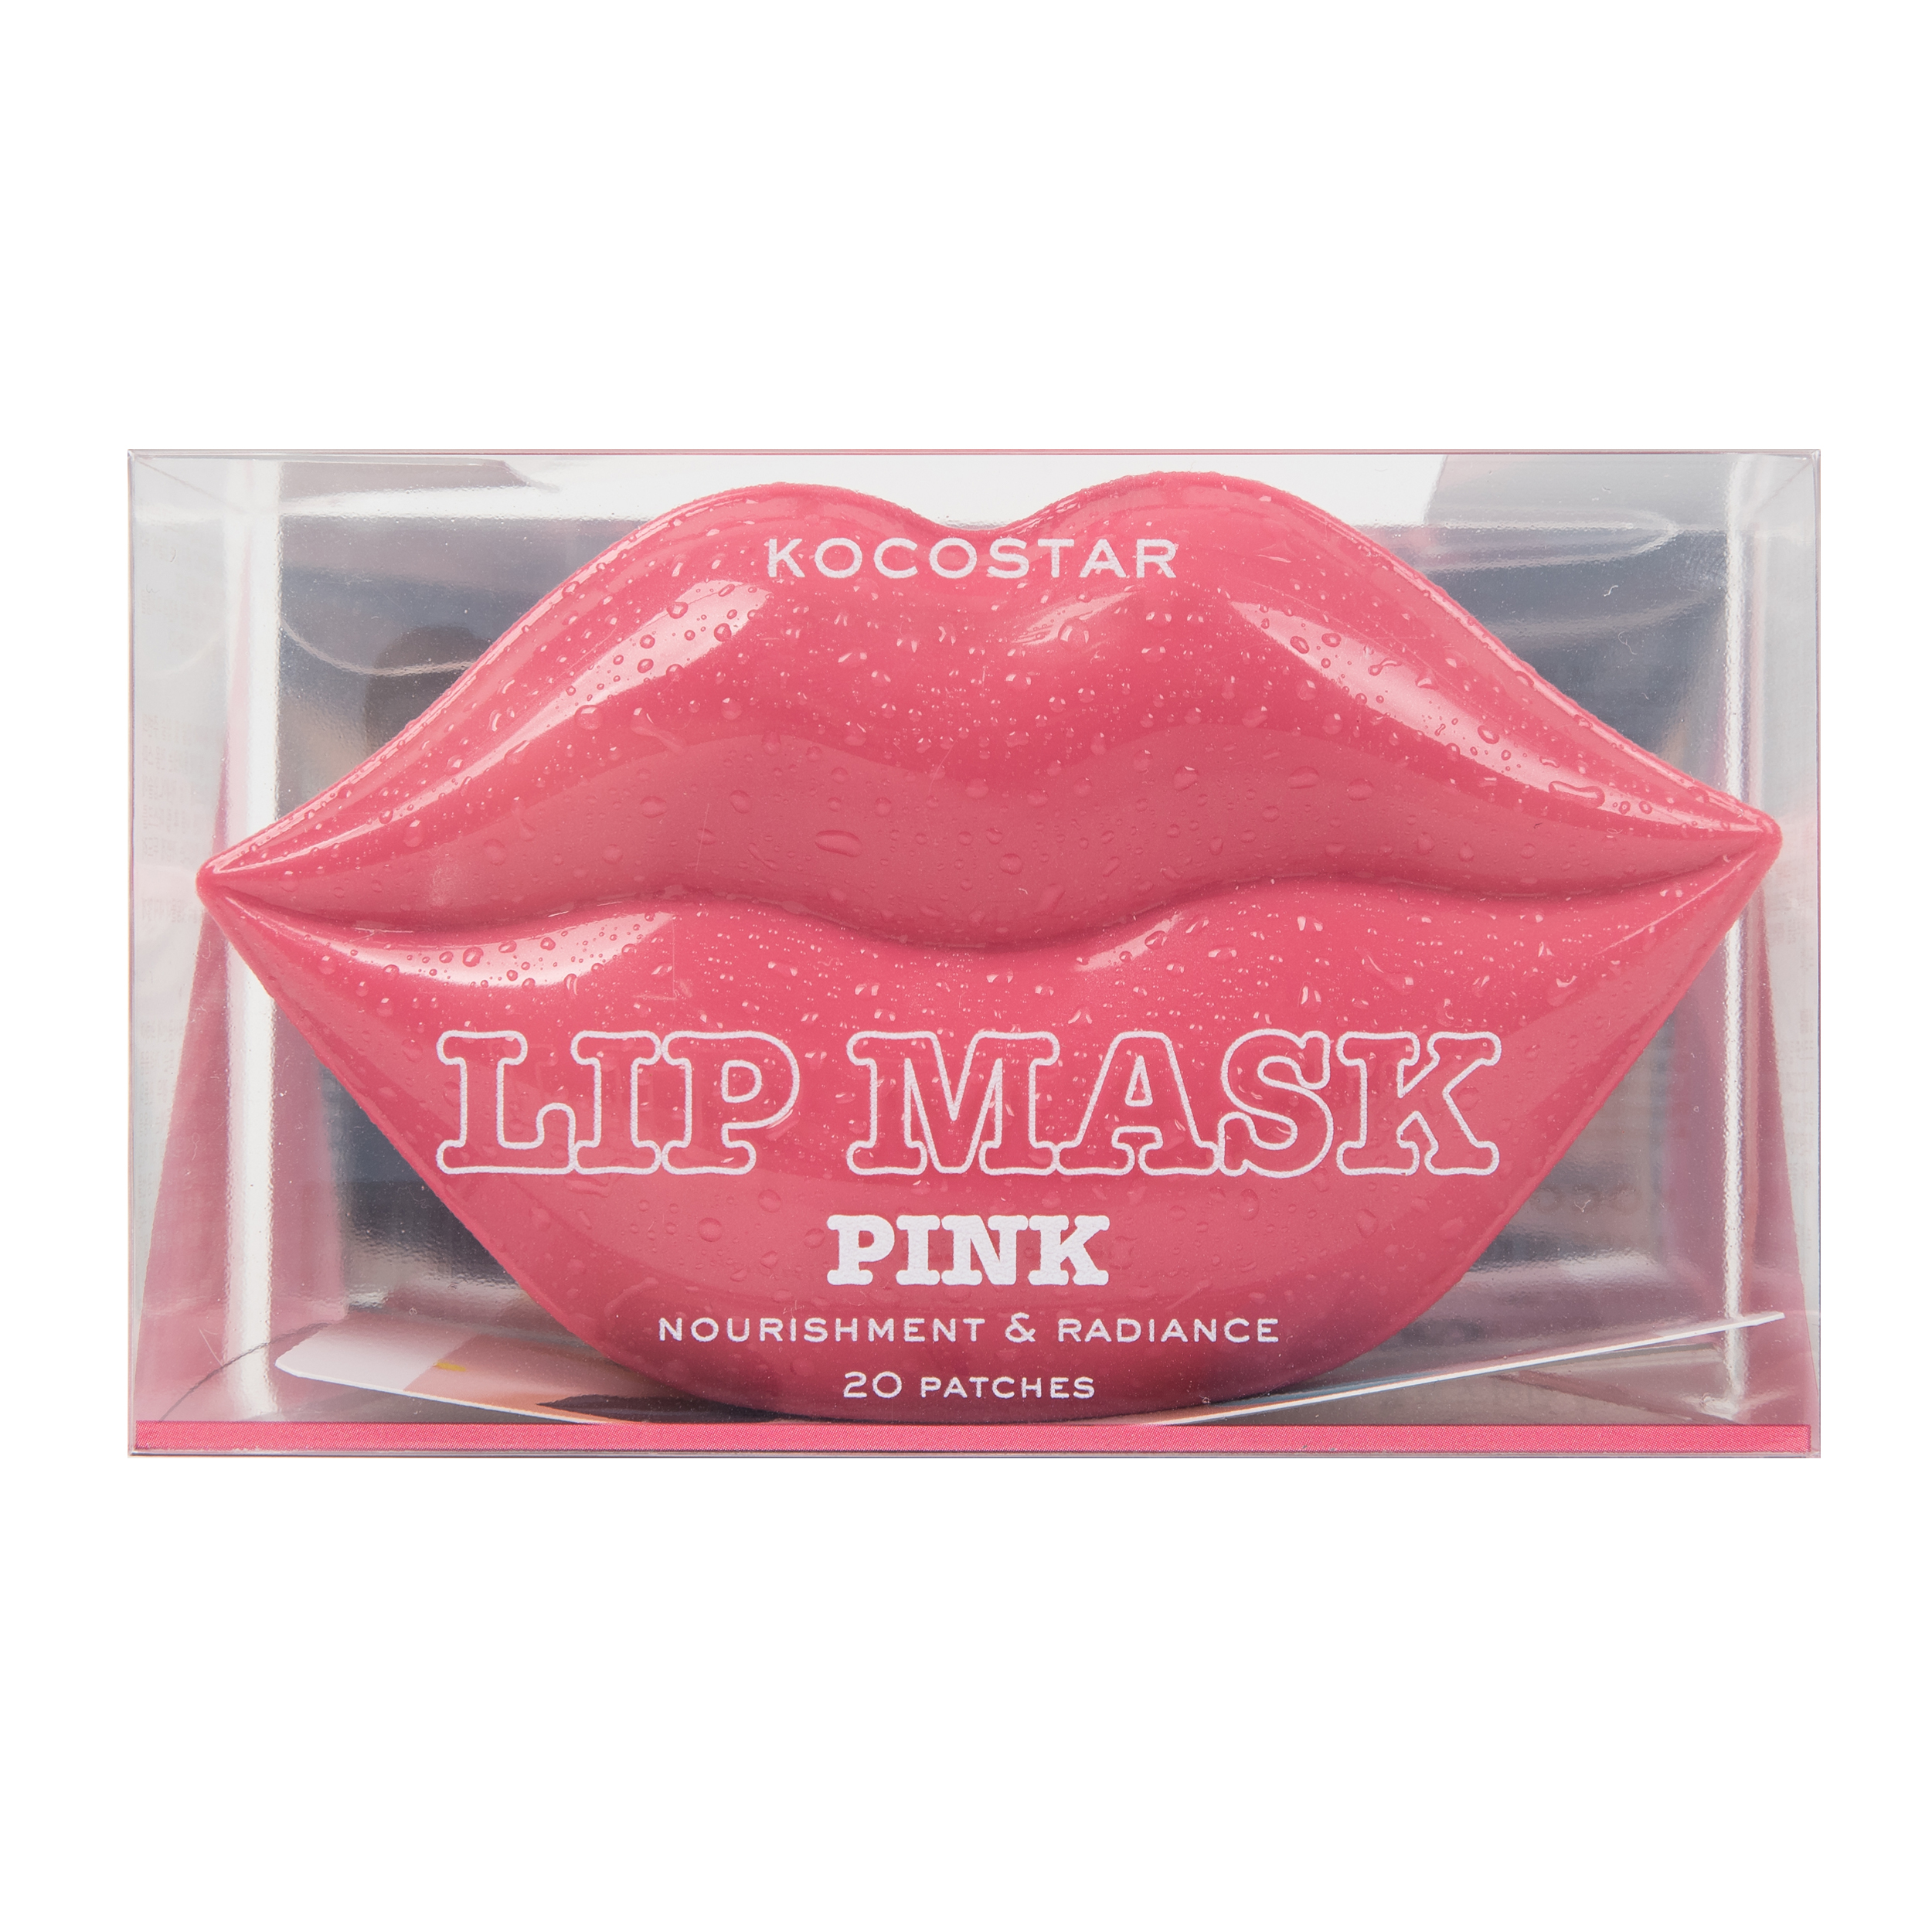 Lip Mask Pink Peach